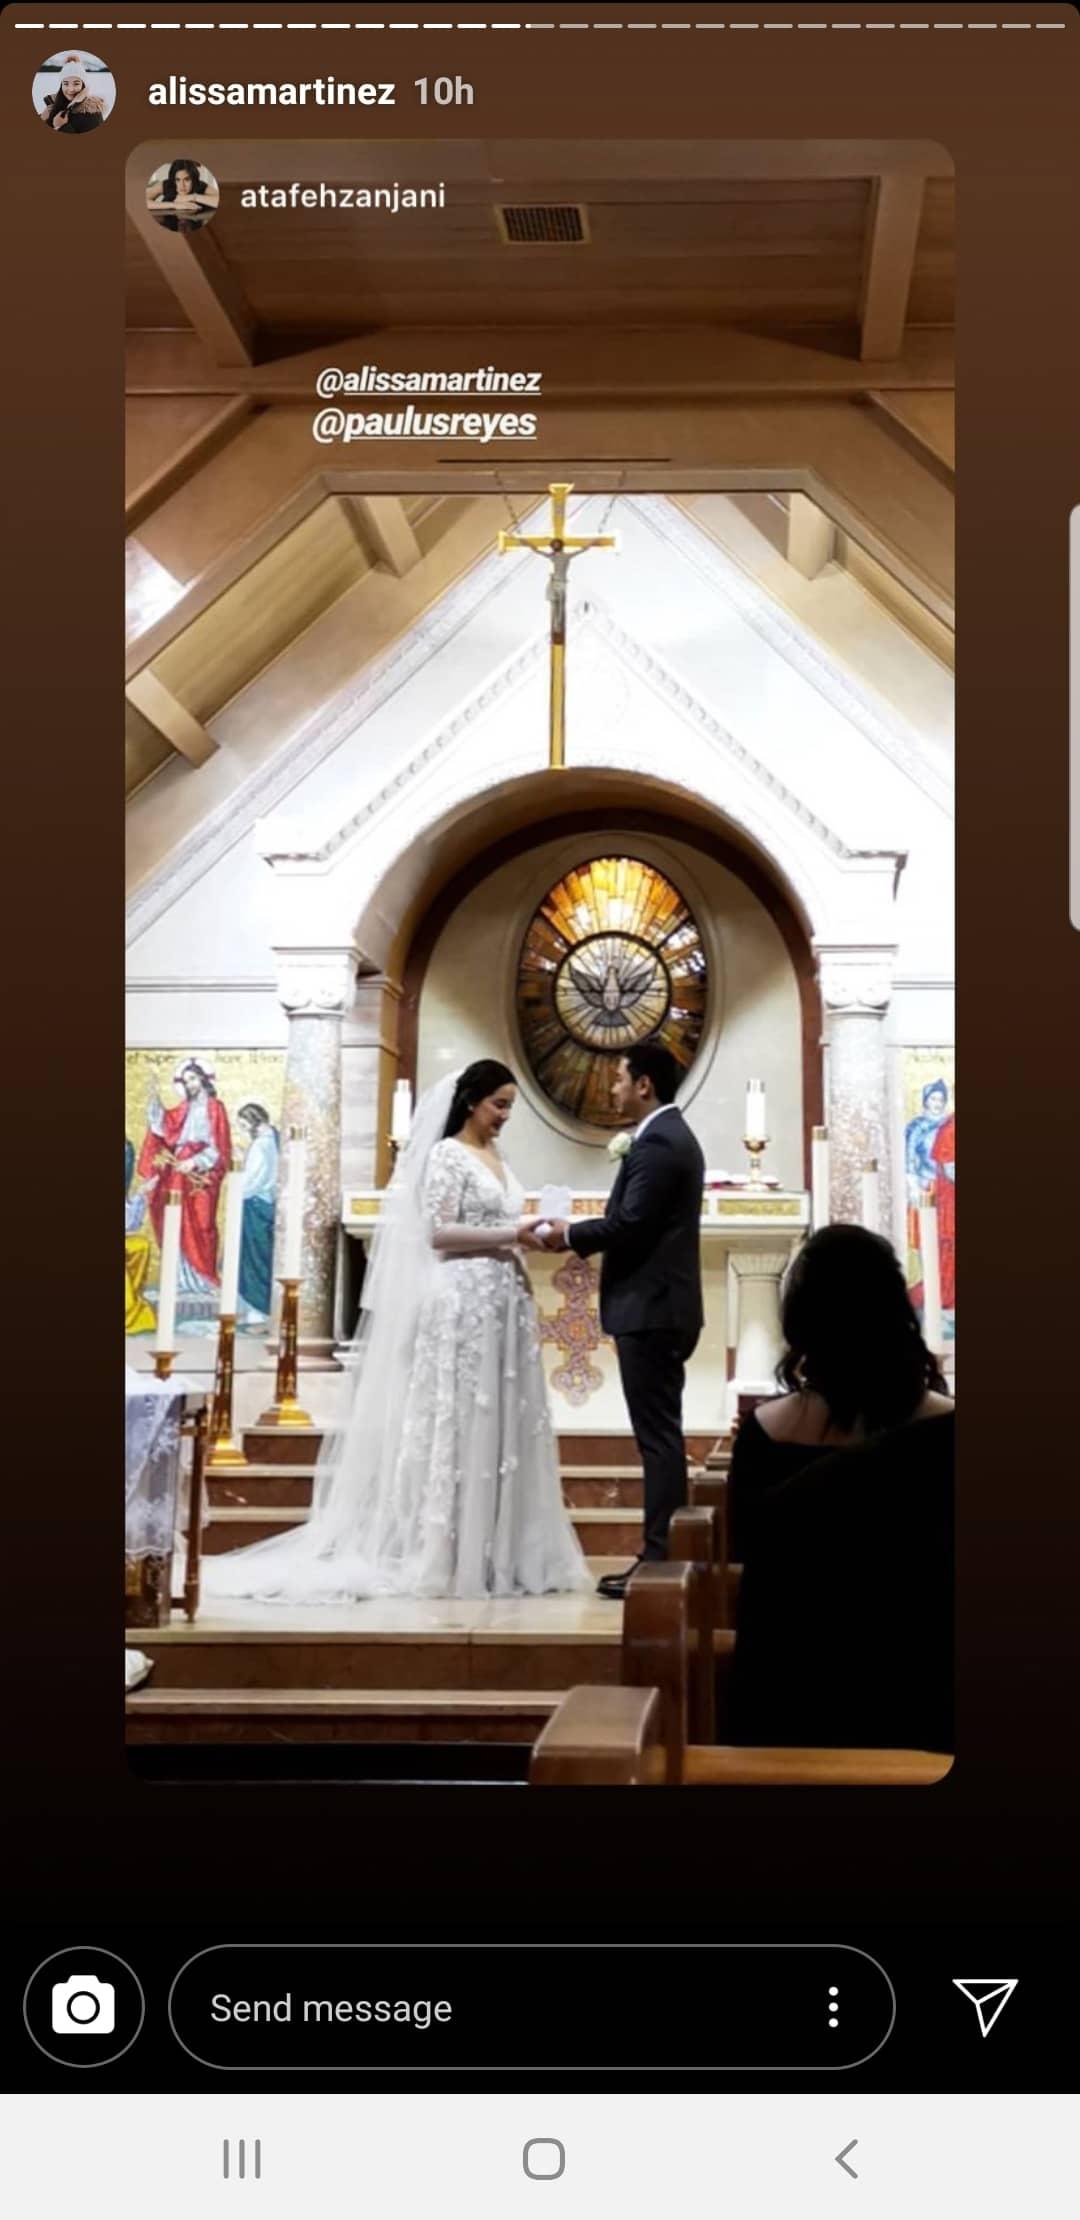 alissa martinez paulus reyes wedding in canada 2